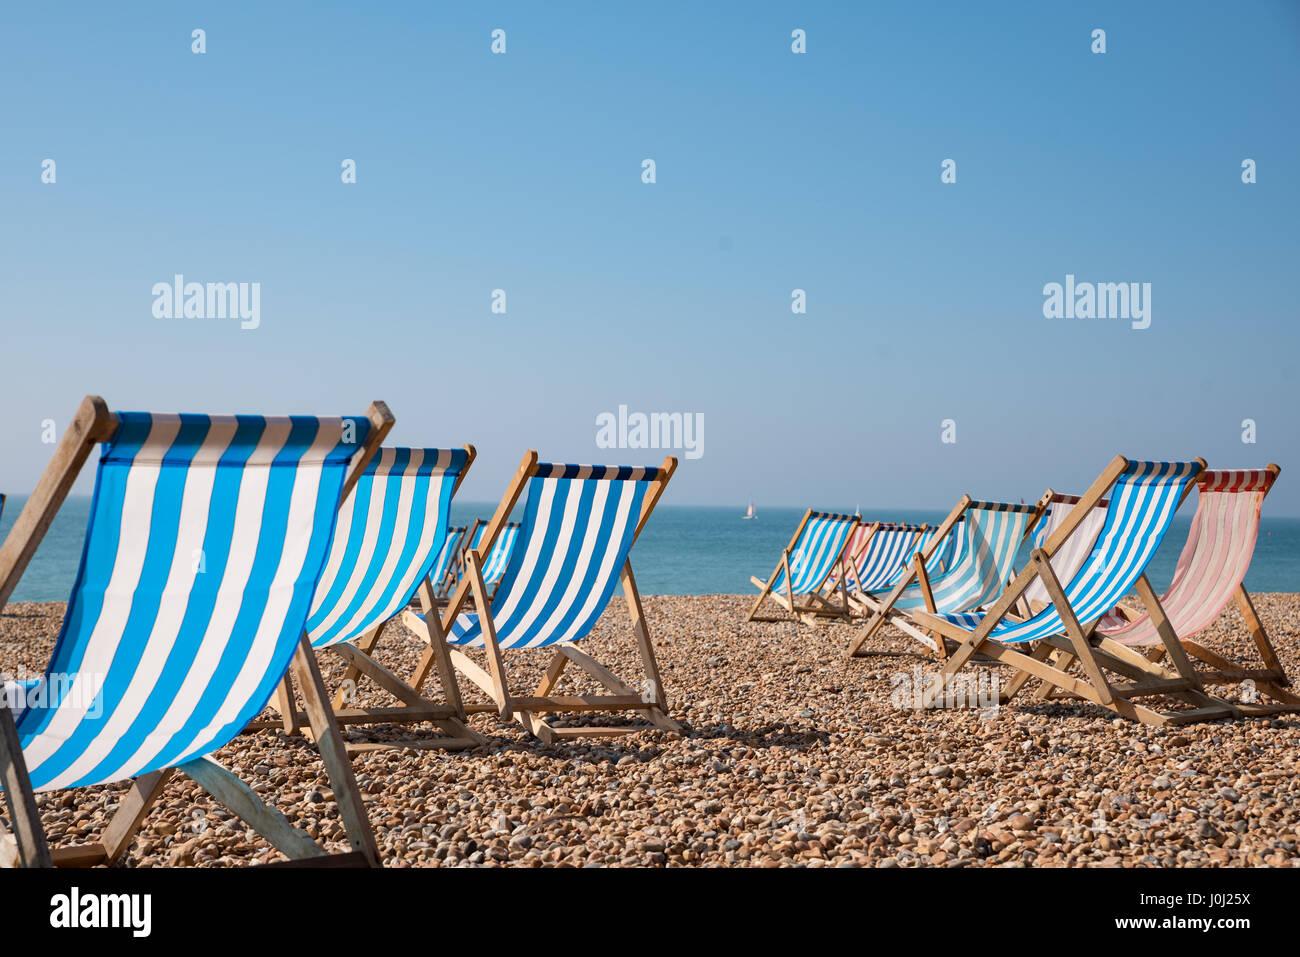 Empty traditional striped deckchairs on Brighton beach, England, UK - Stock Image